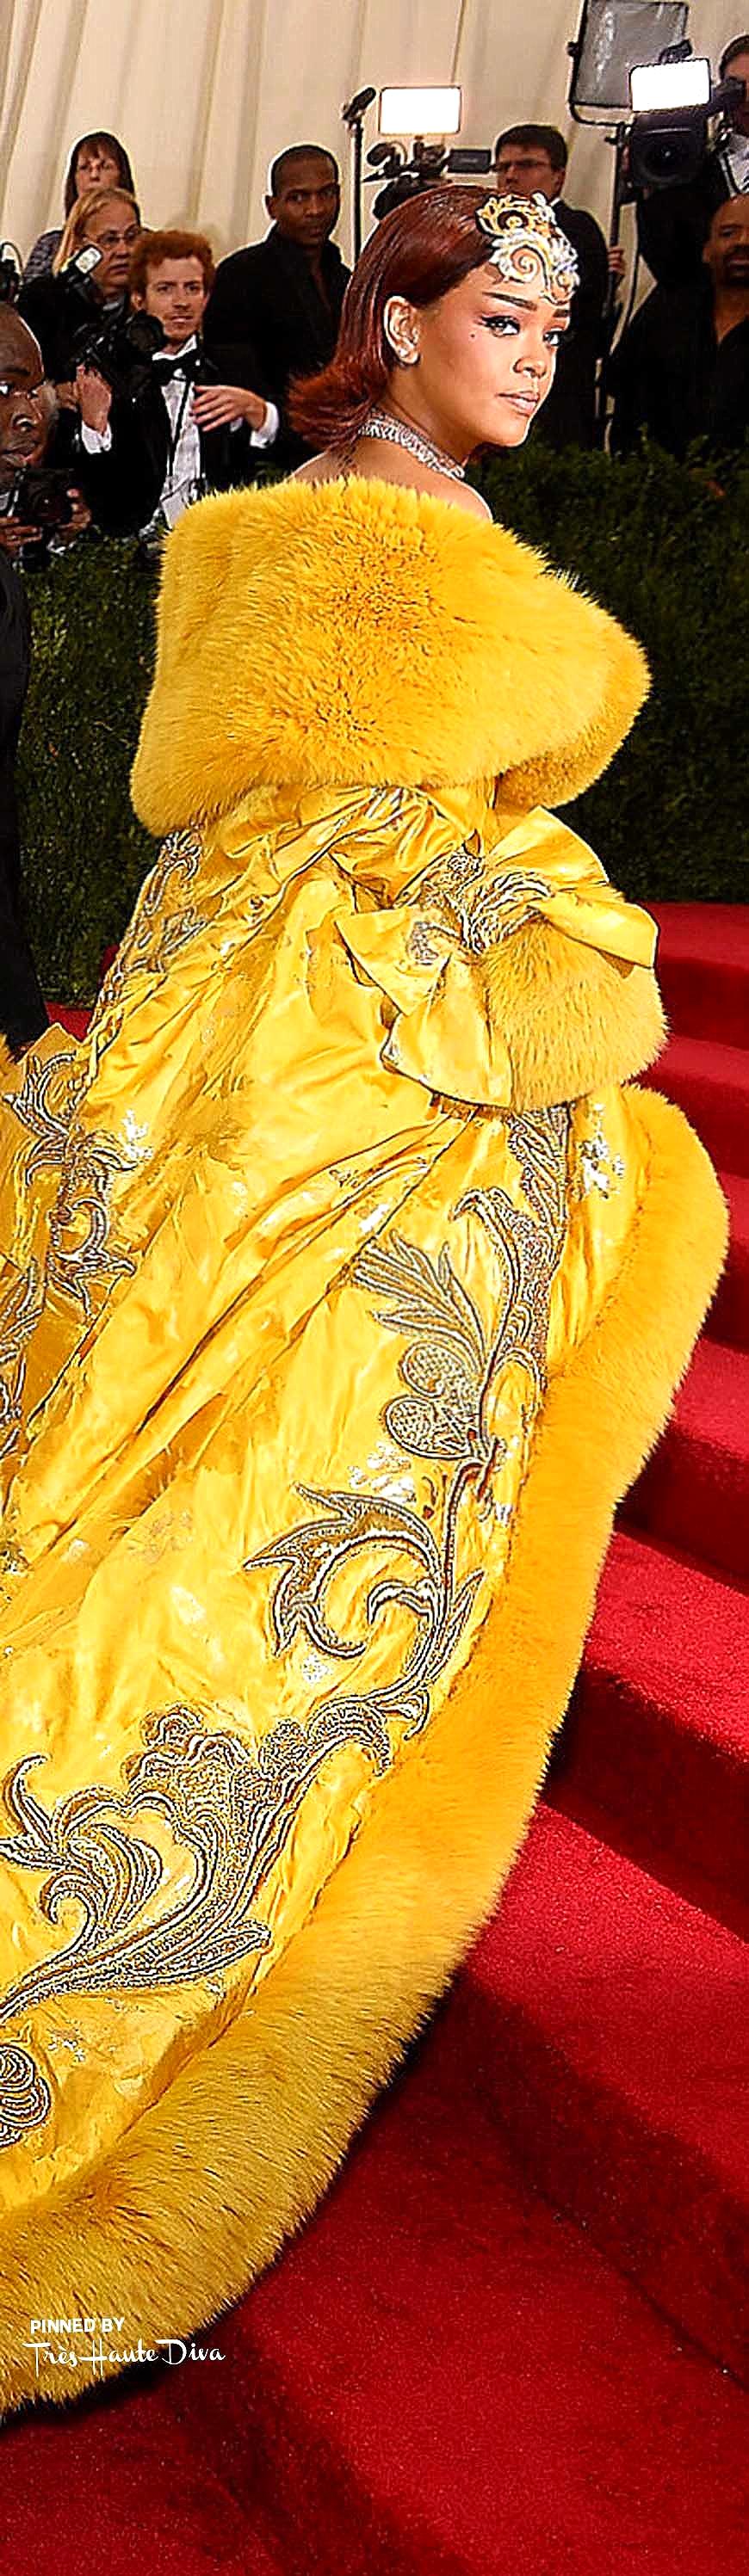 Rihanna in Guo Pei Couture Getty Images/ Dimitrios Kambouris